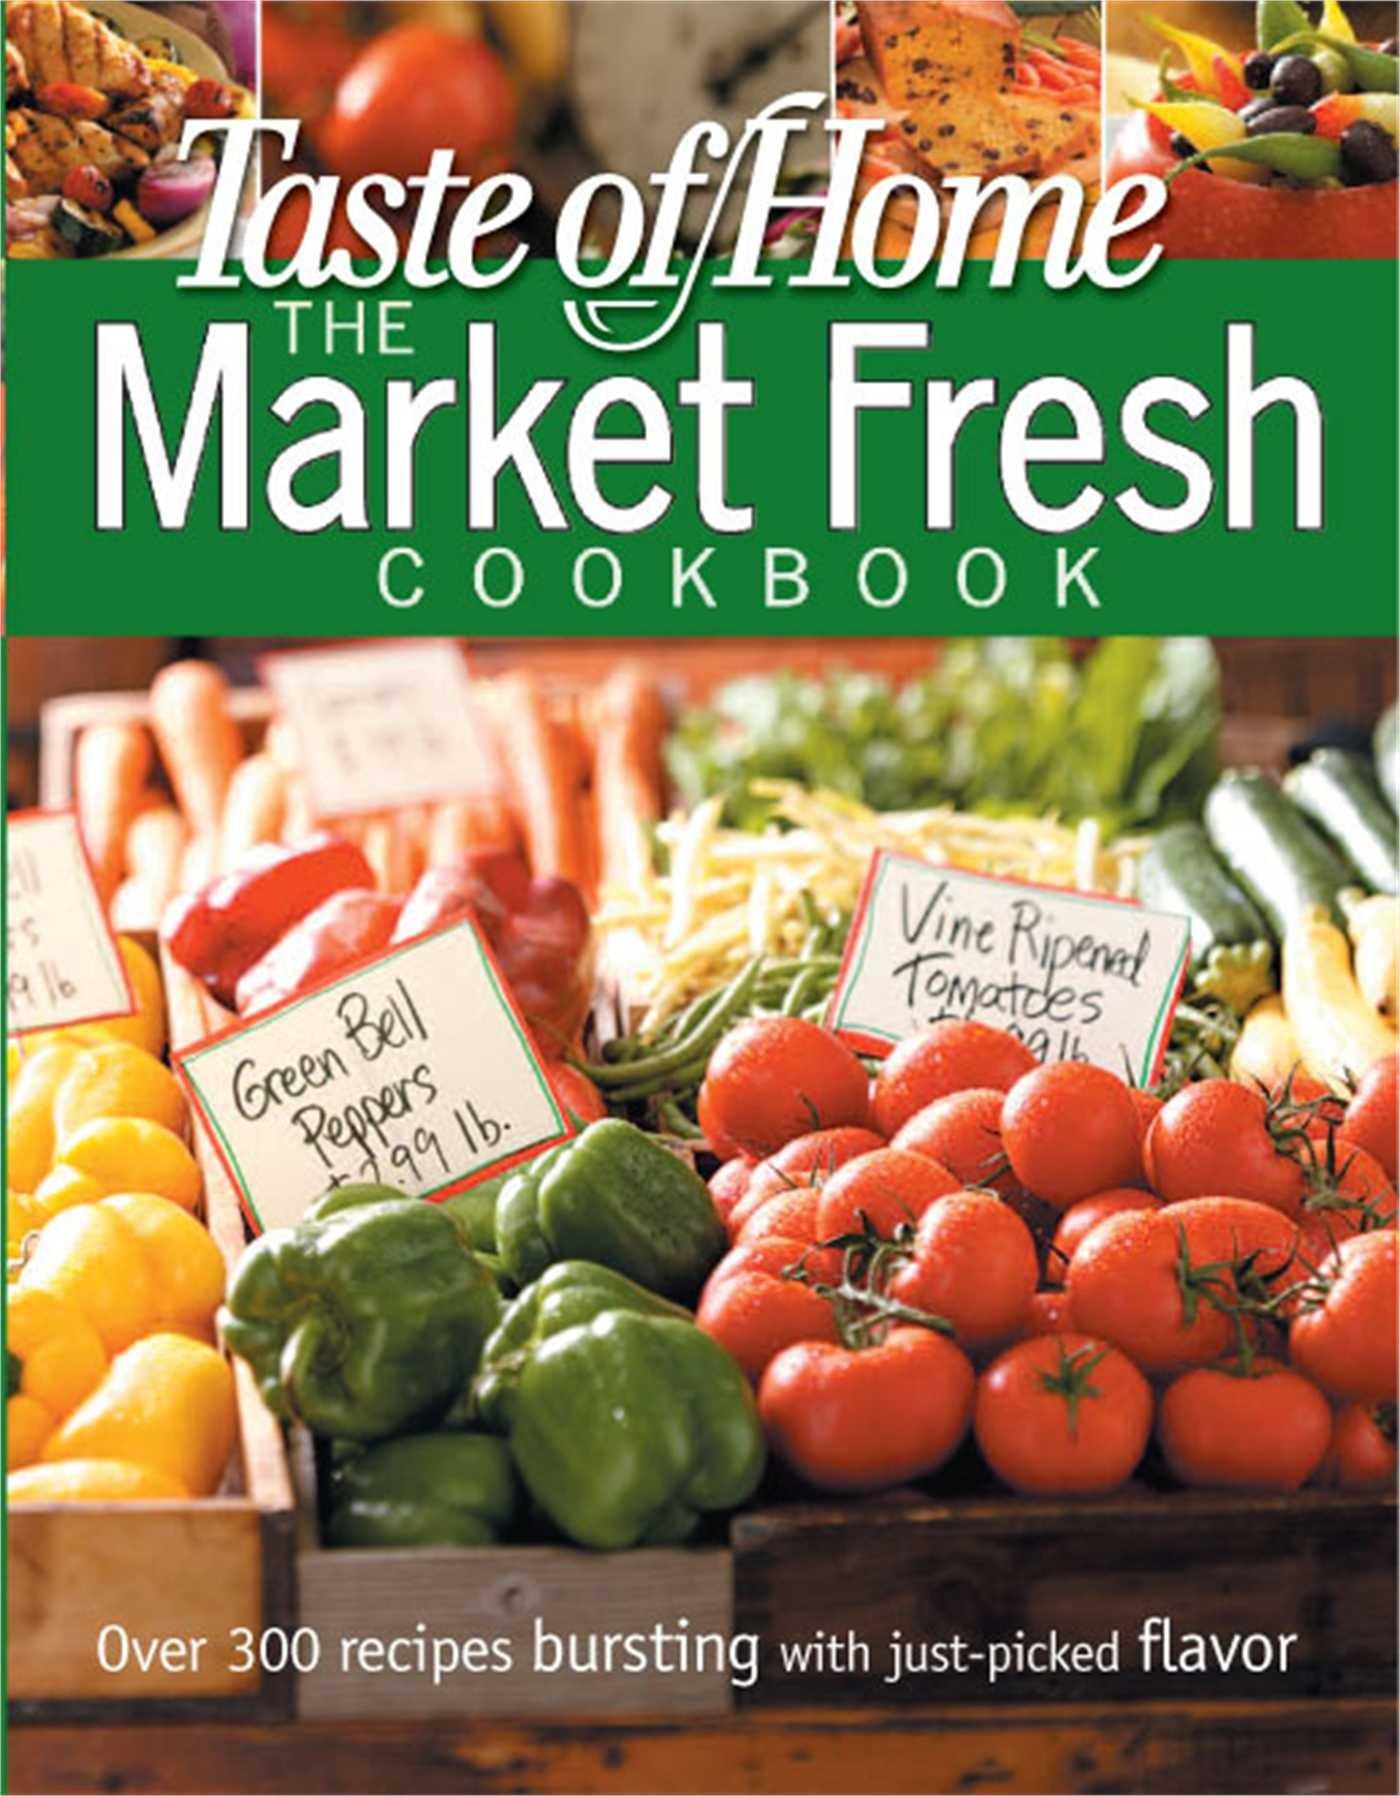 Taste Of Home Market Fresh Cookbook Taste Of Home Annual Recipes Editors Of Reader S Digest 9780898216967 Amazon Com Books